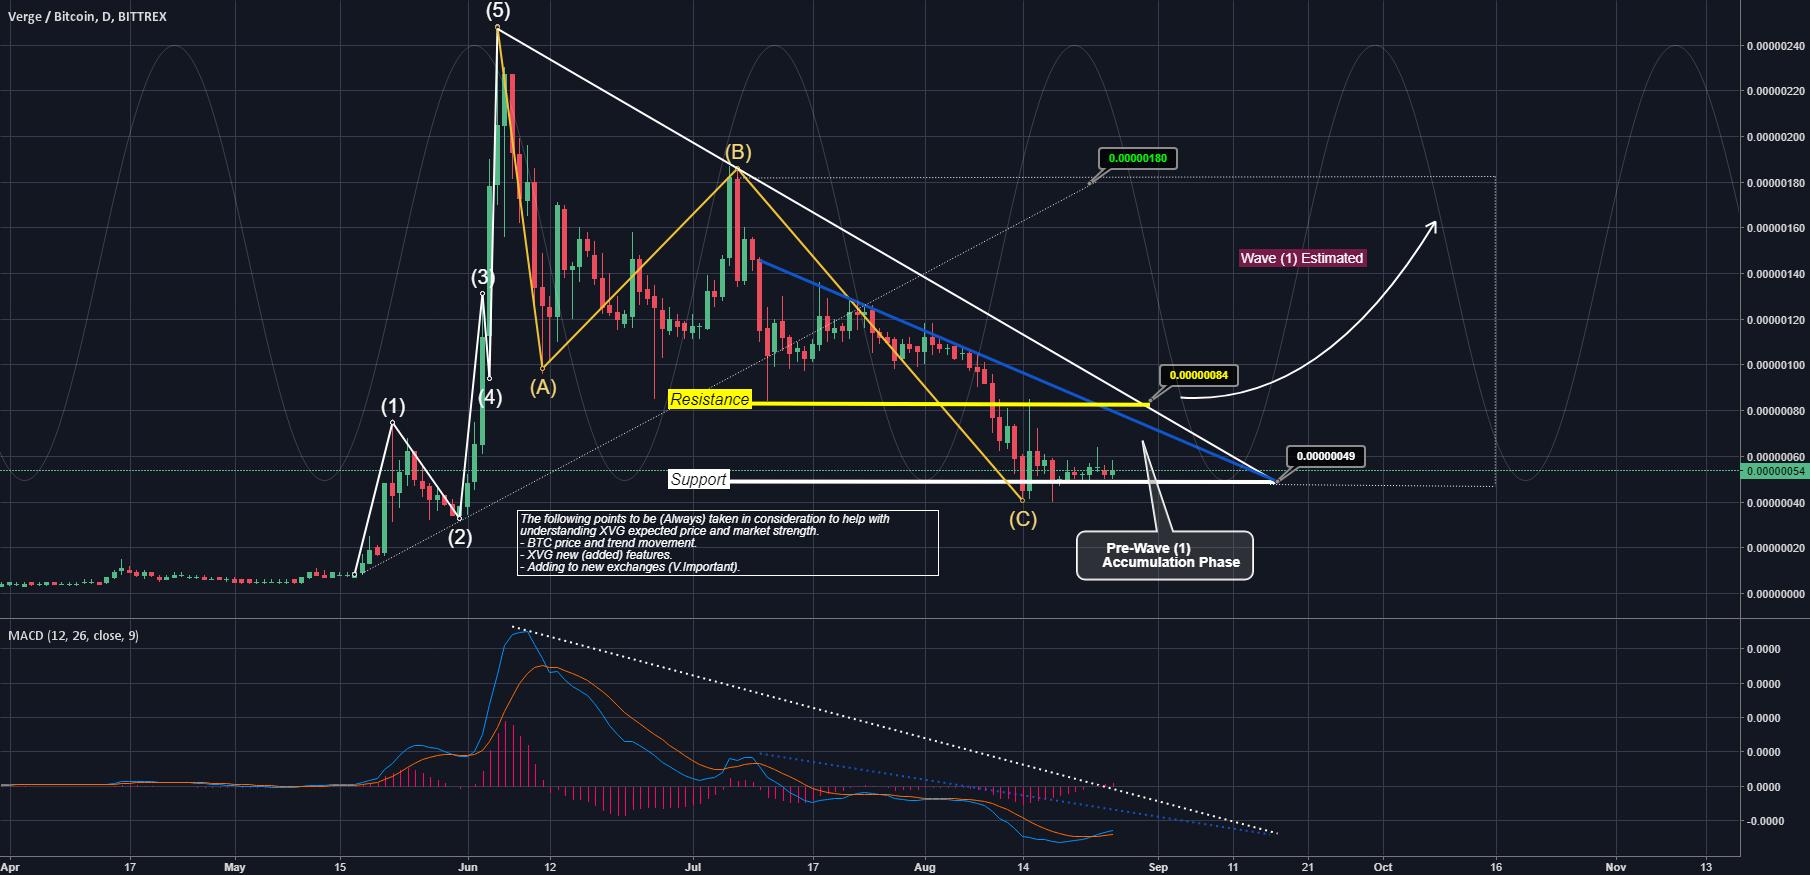 Verge (XVG) market prediction - End of E.Wave Correction Wave(C)